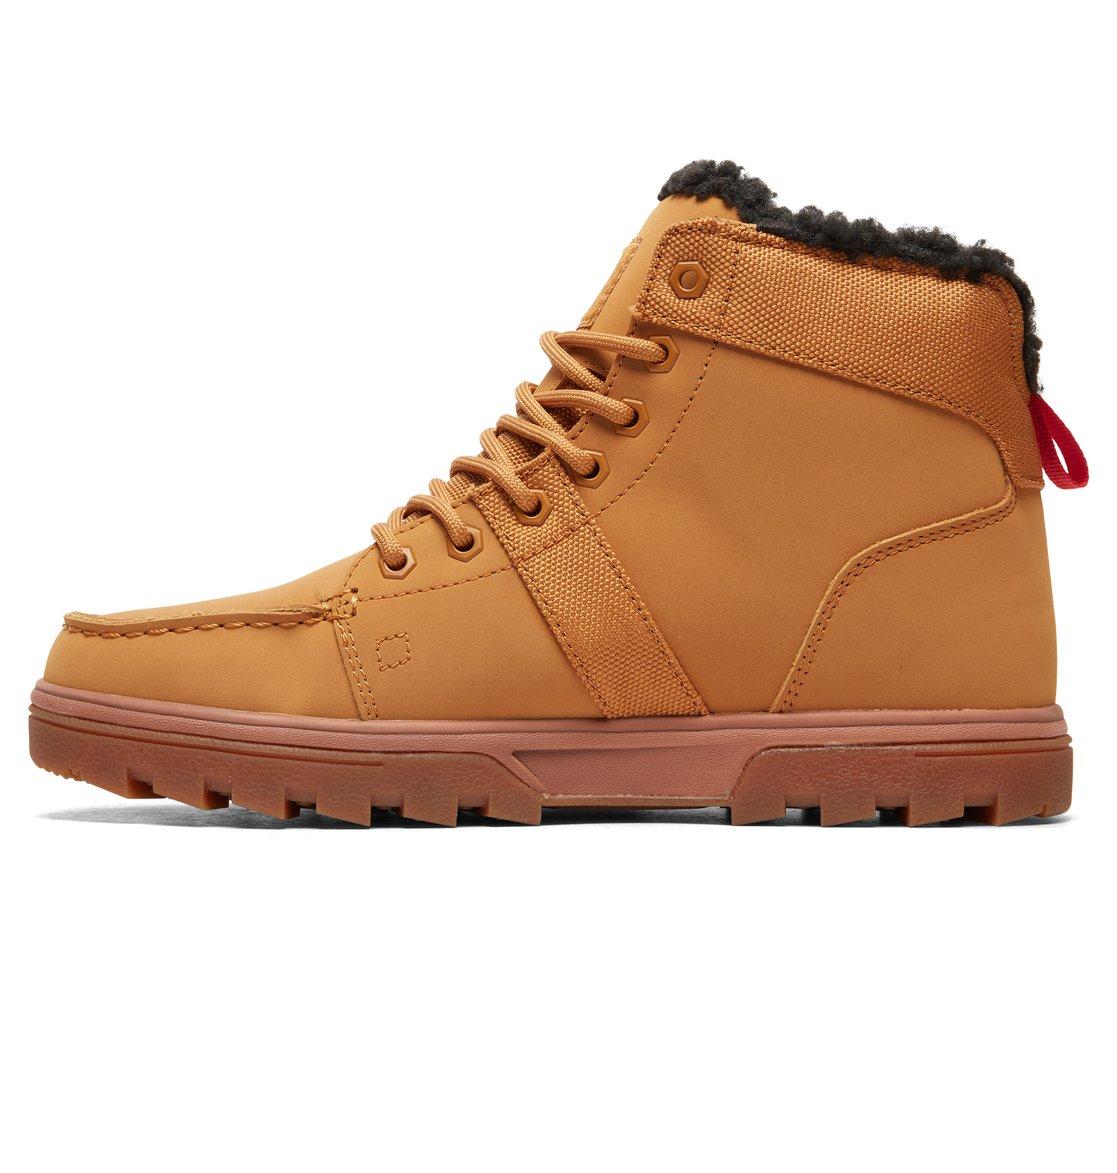 2f7cac56b 2 Ботинки Woodland Коричневый 303241 DC Shoes